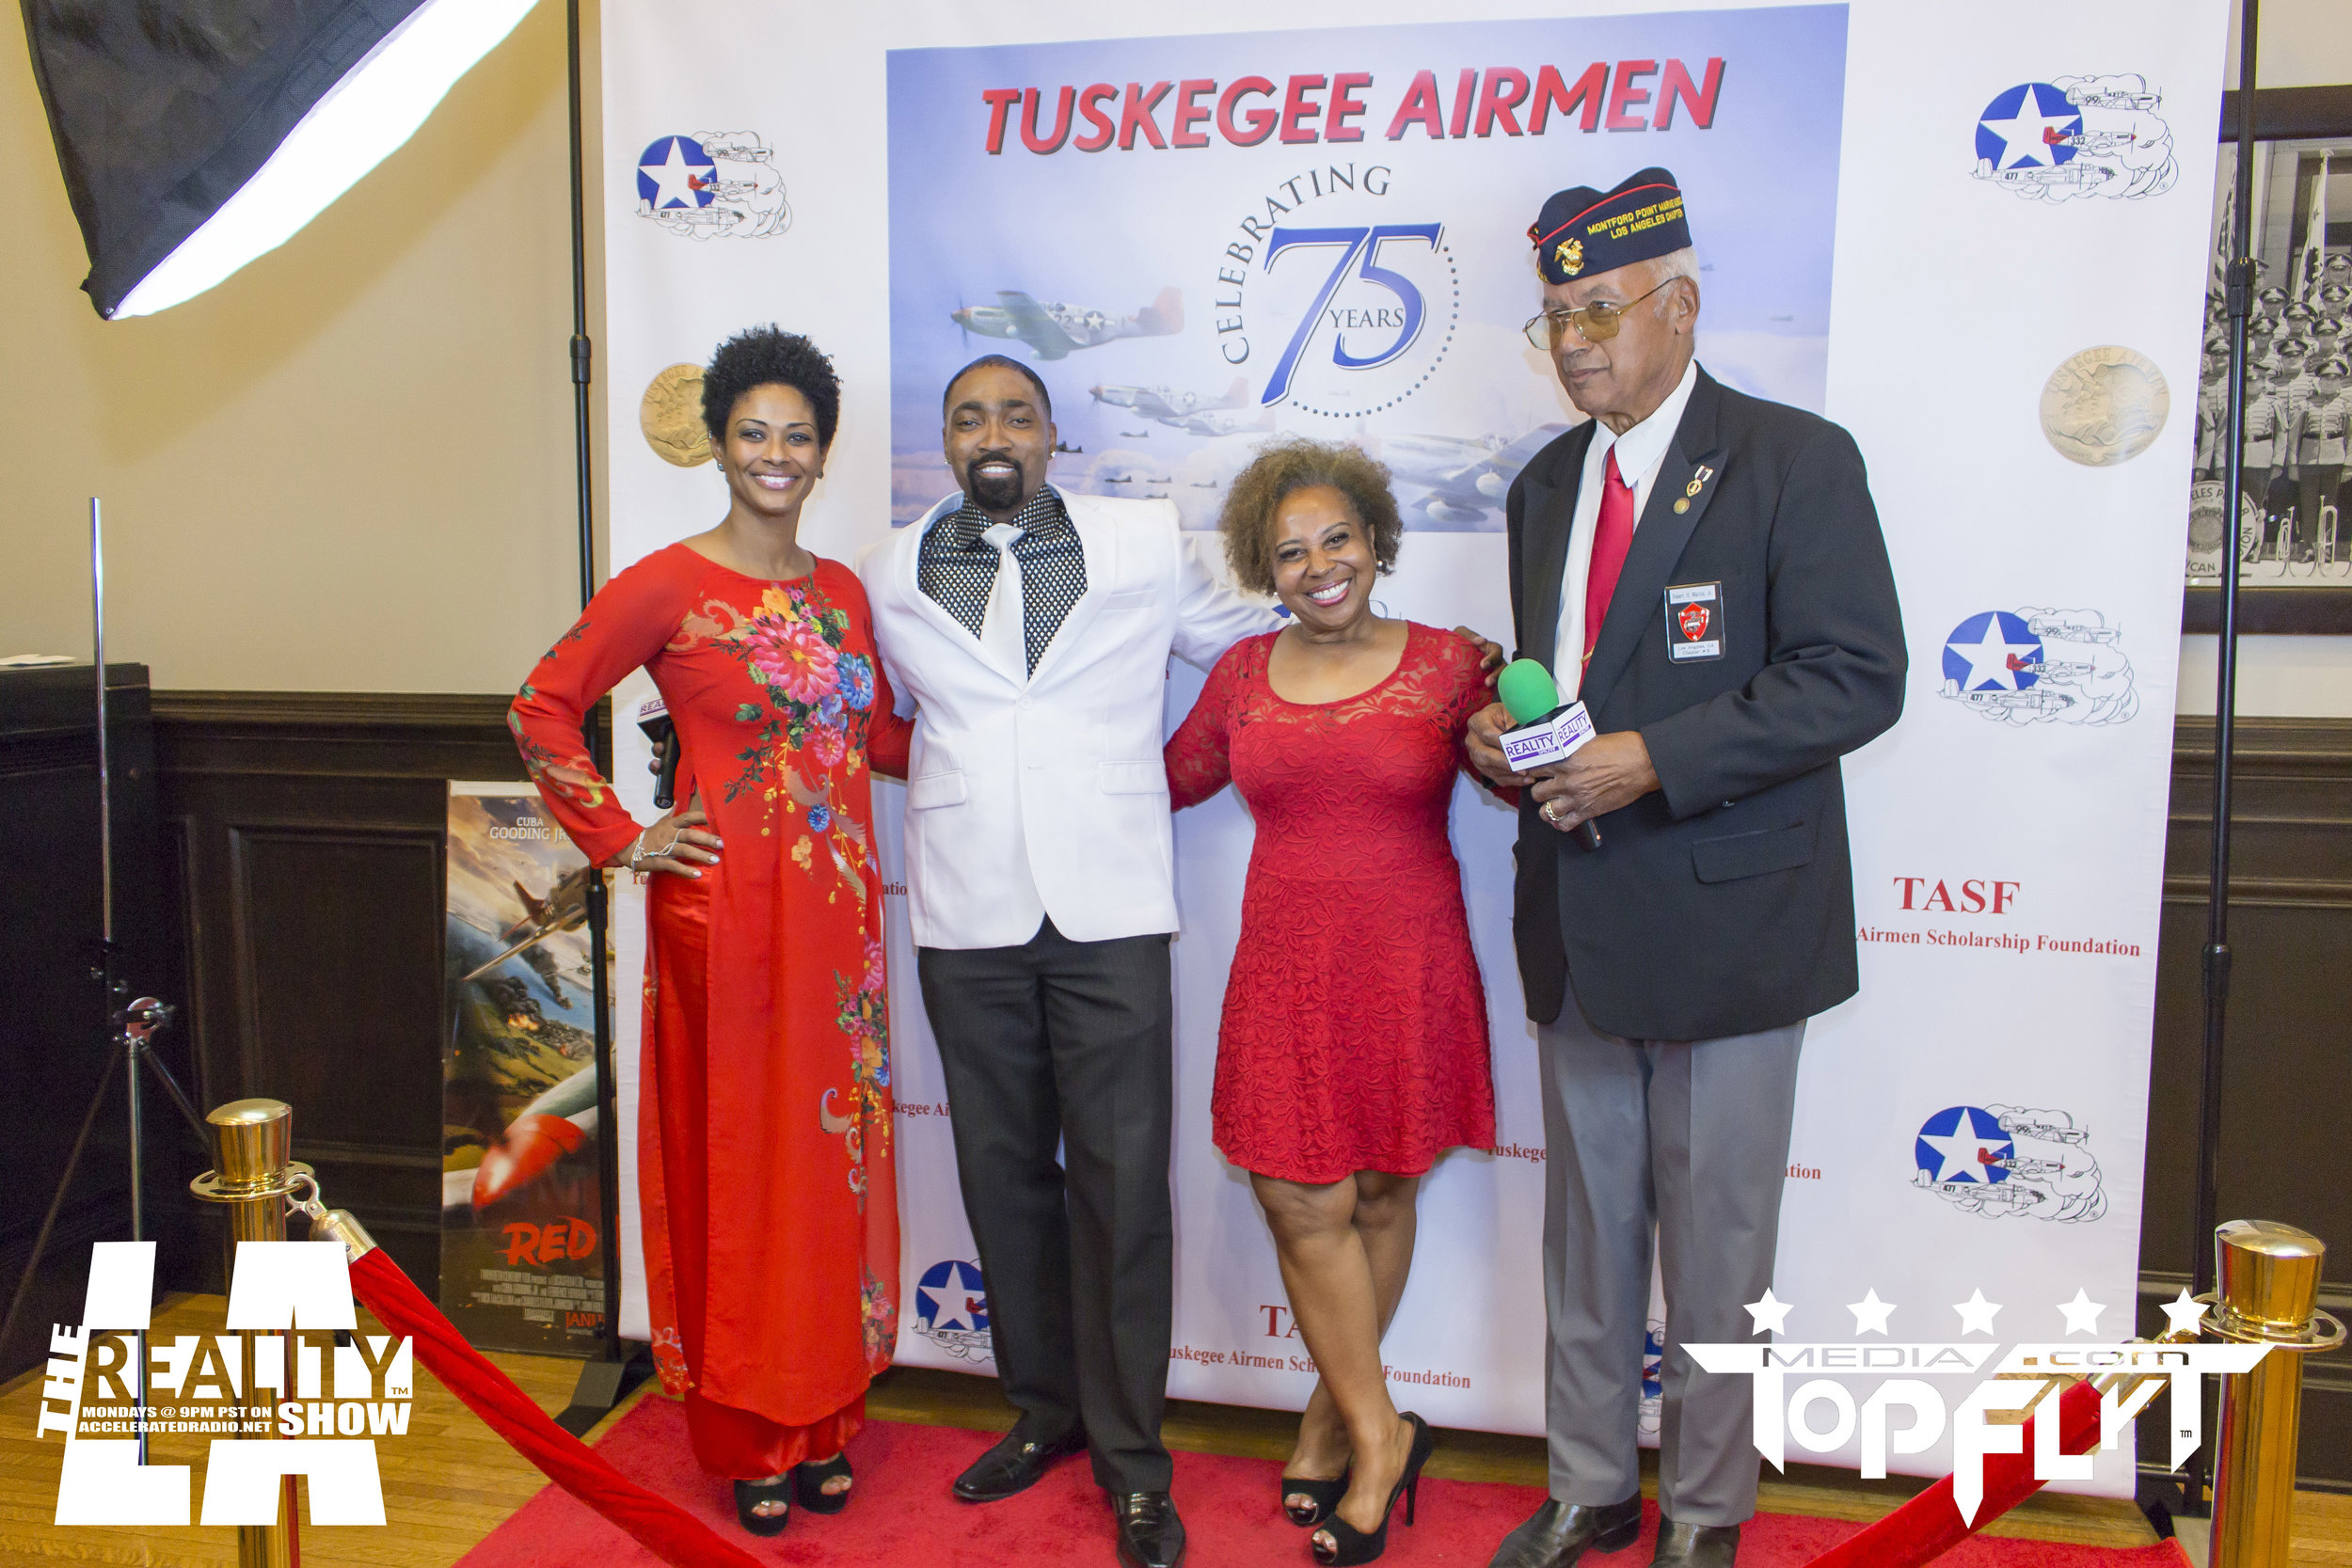 The Reality Show LA - Tuskegee Airmen 75th Anniversary VIP Reception_63.jpg